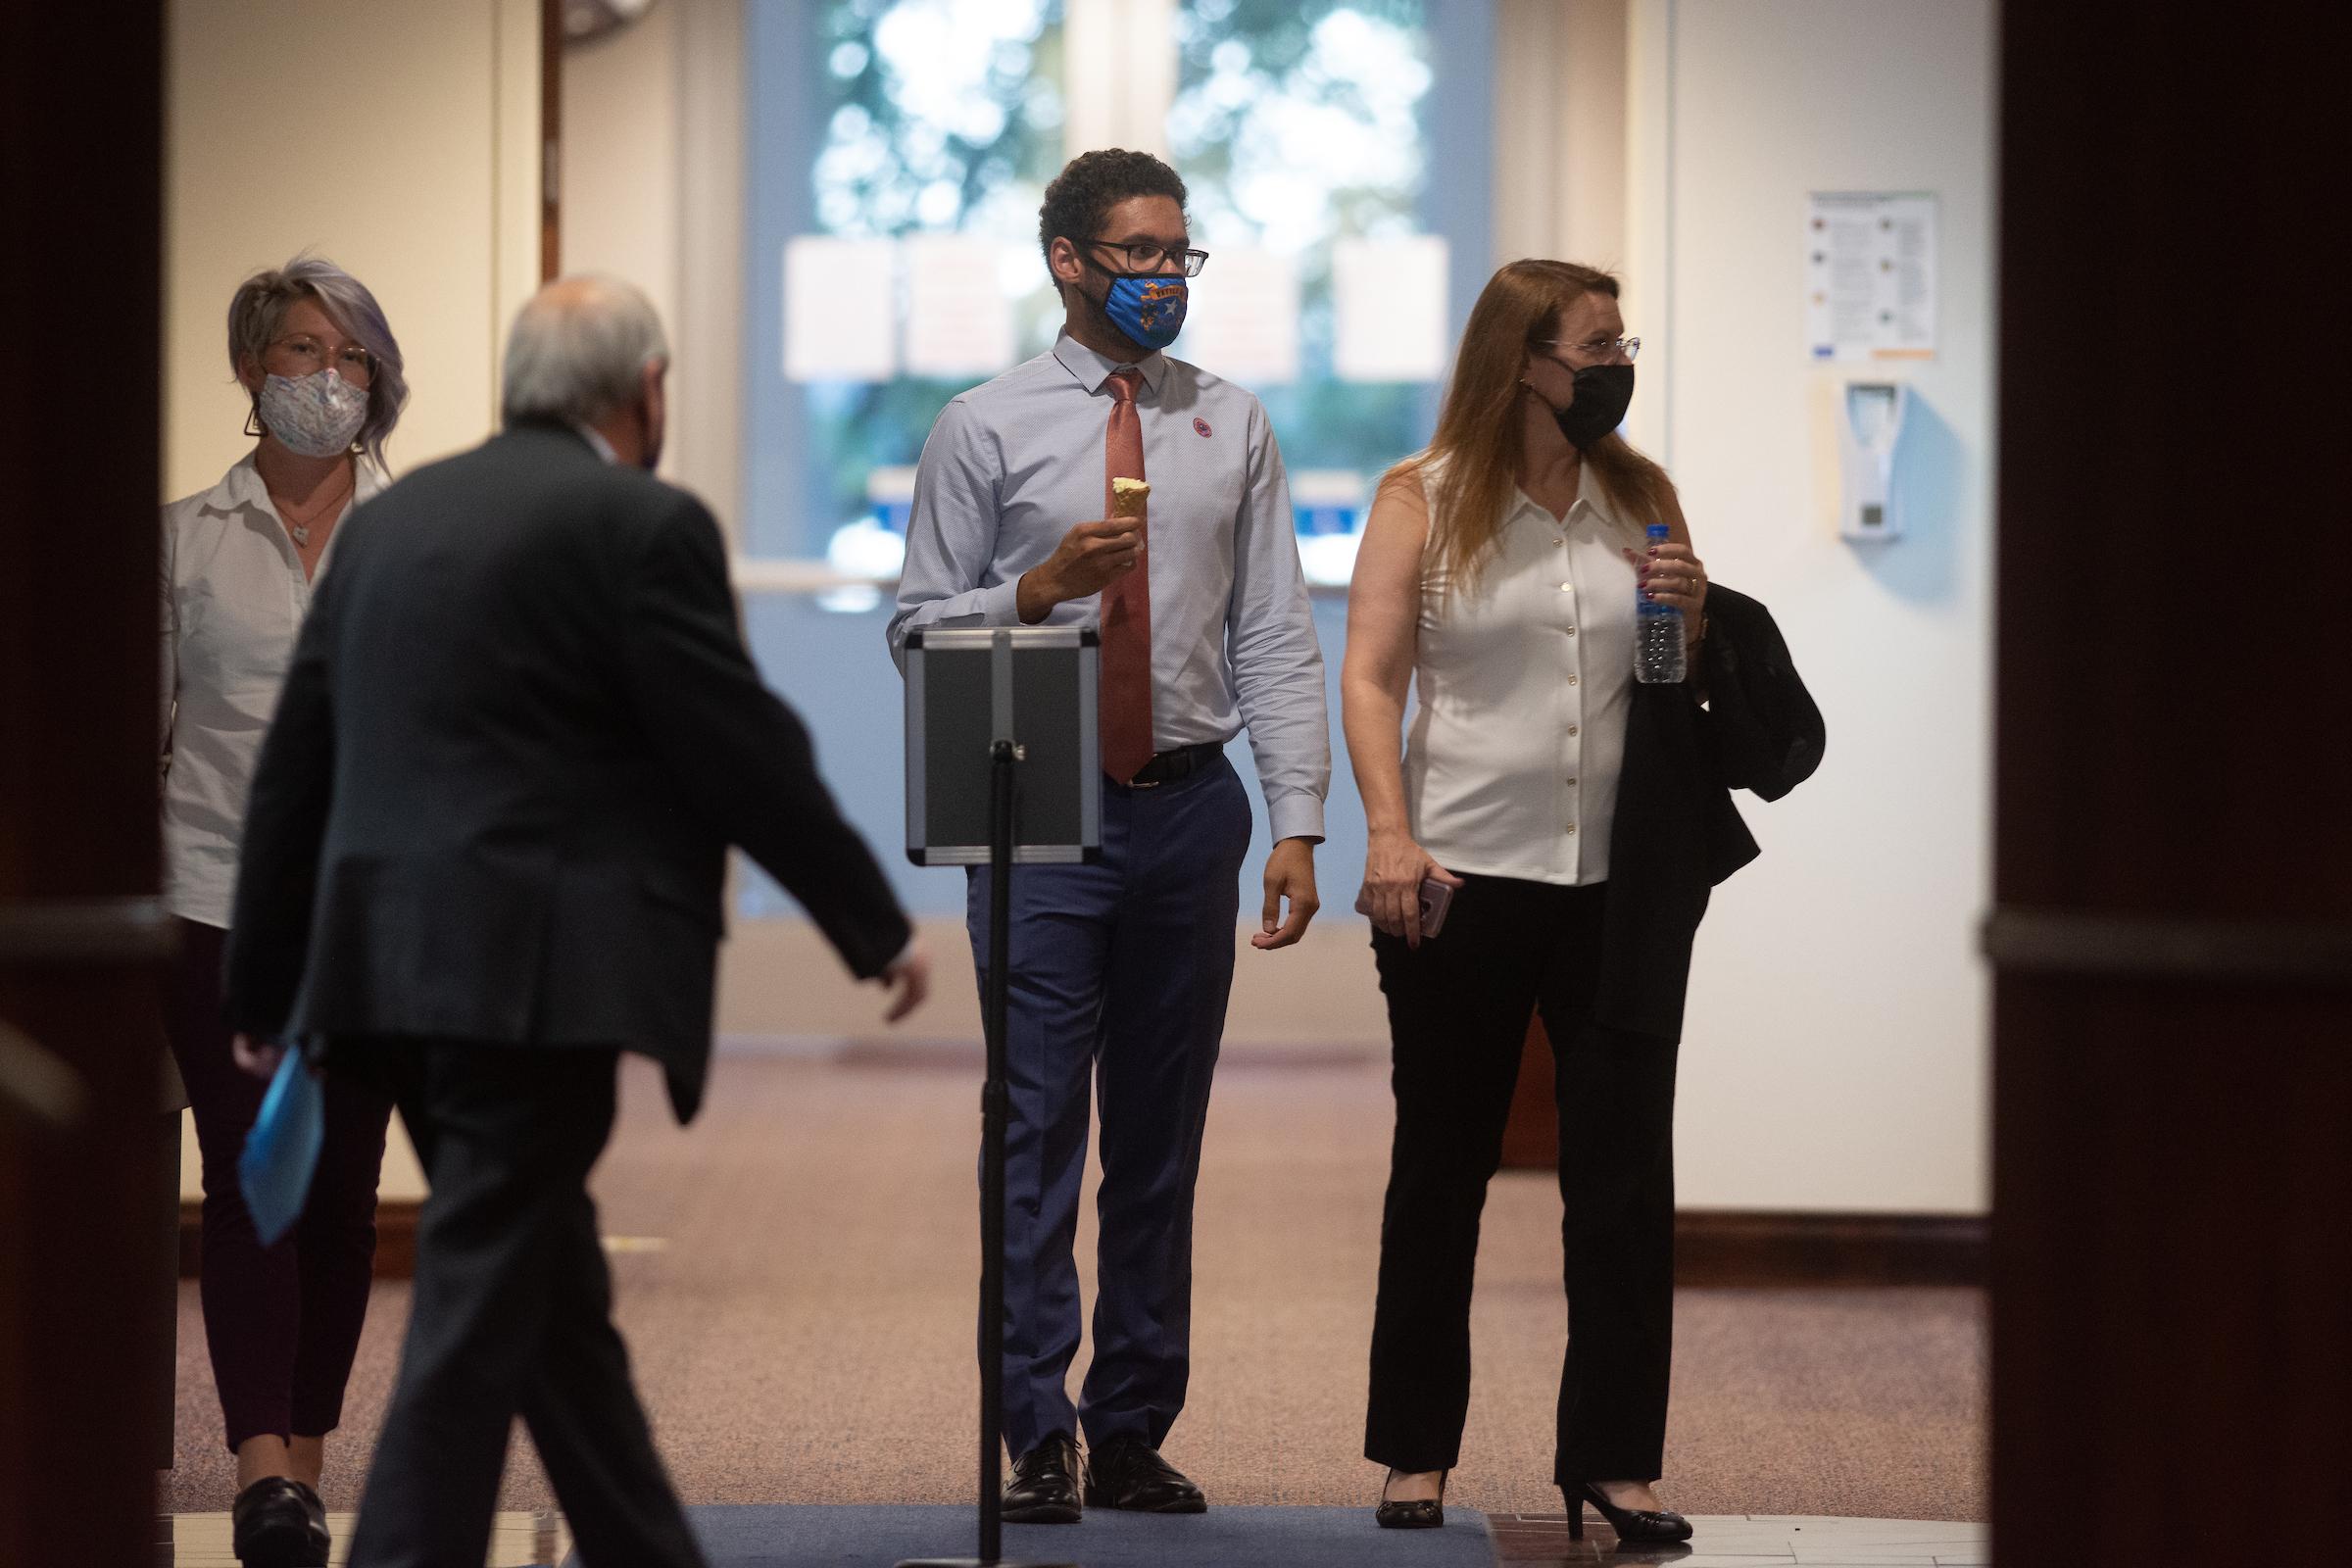 Assembly members Sarah Peters, Howard Watts II and Michelle Gorelow walking in a hallway in the Legislature Building